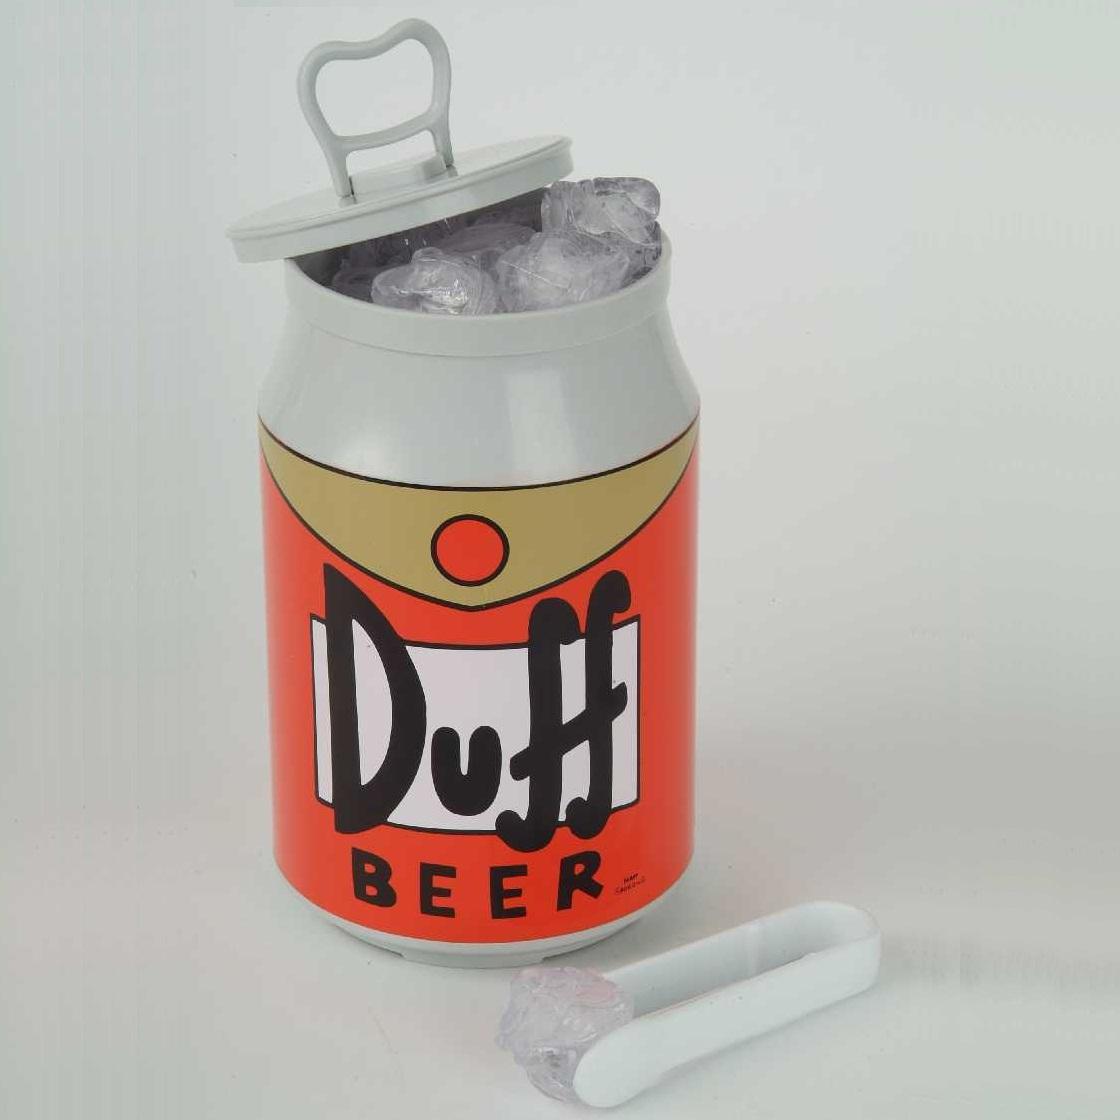 Talking Ice Bucket Duff Beer Homer The Simpsons